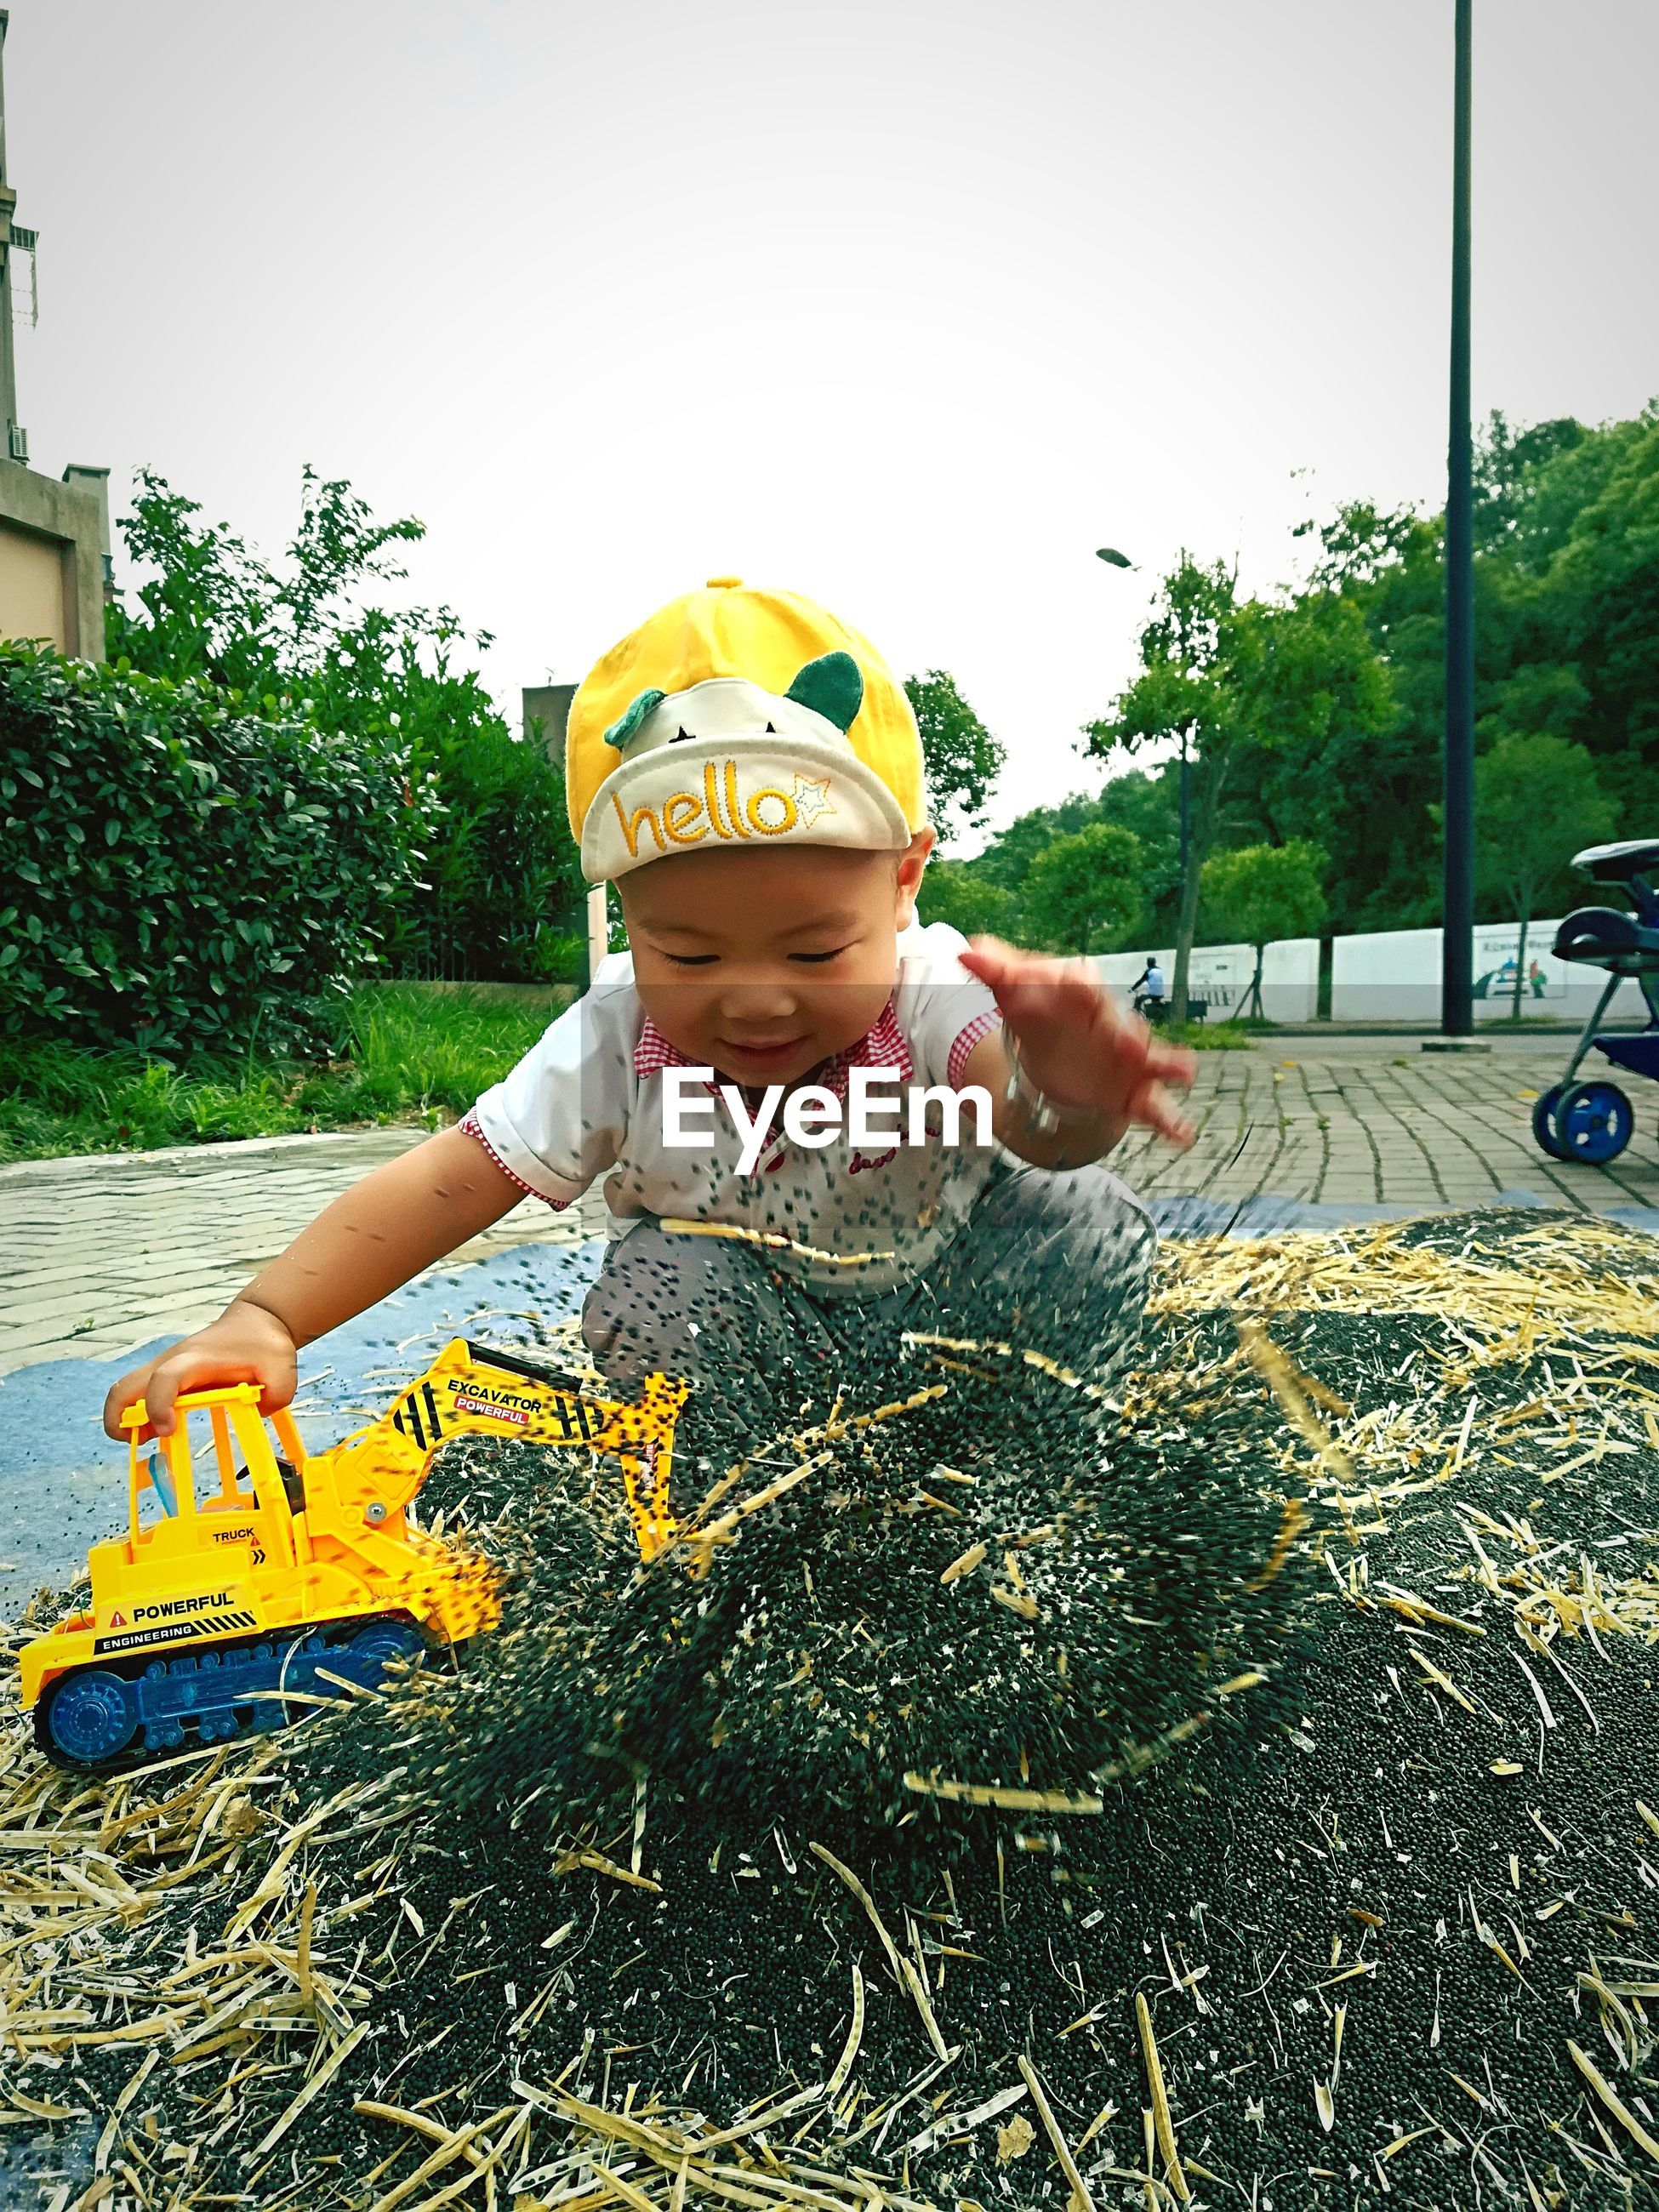 Baby boy splashing dirt at playground